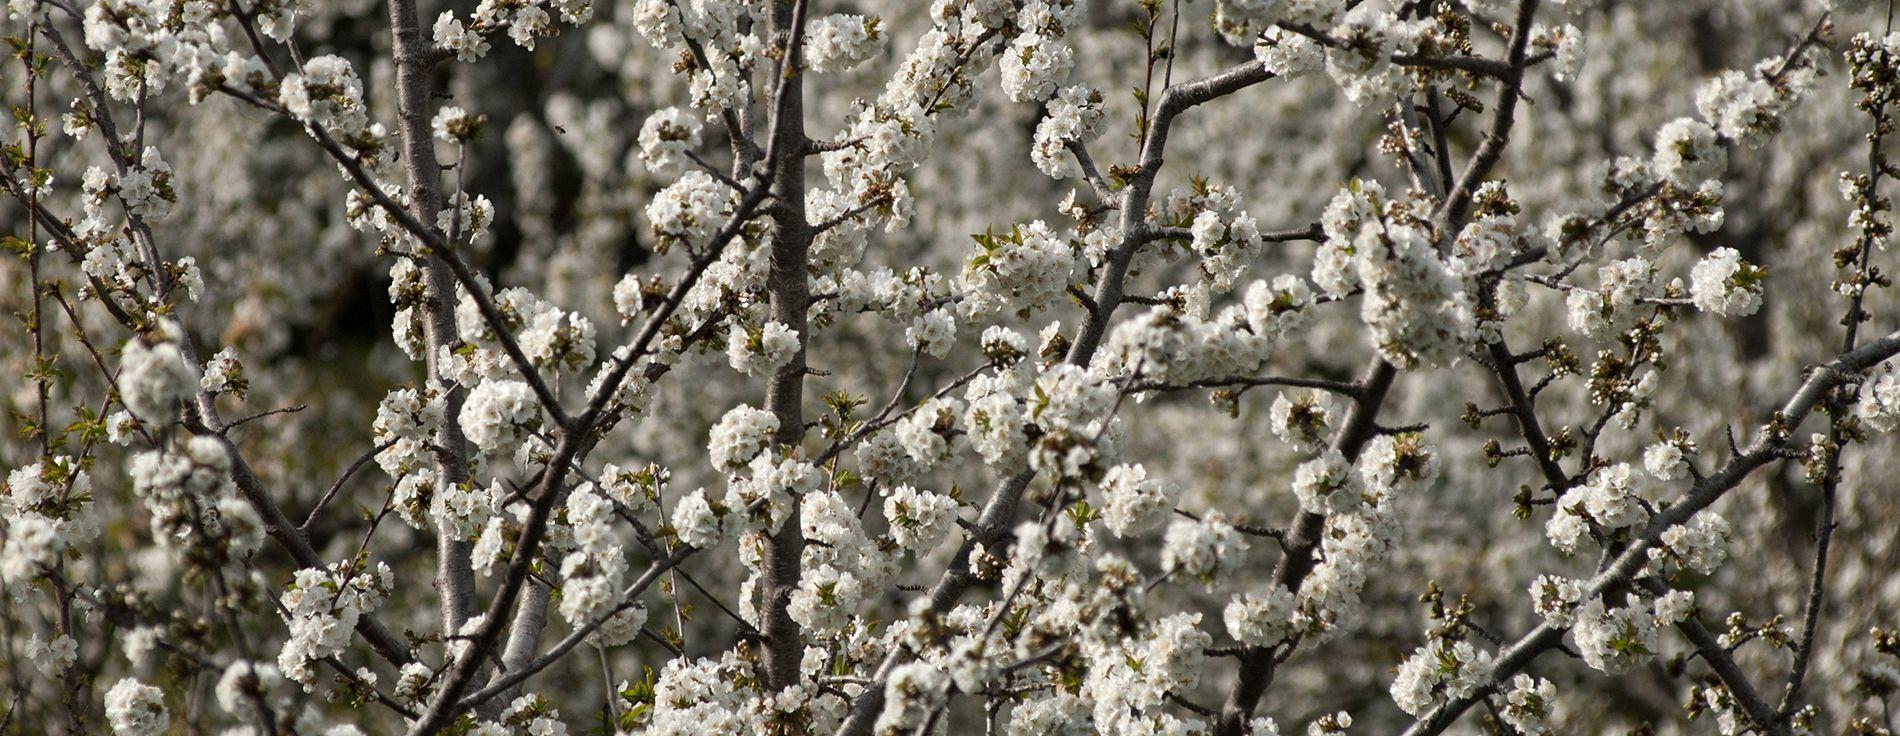 Conyegar primavera